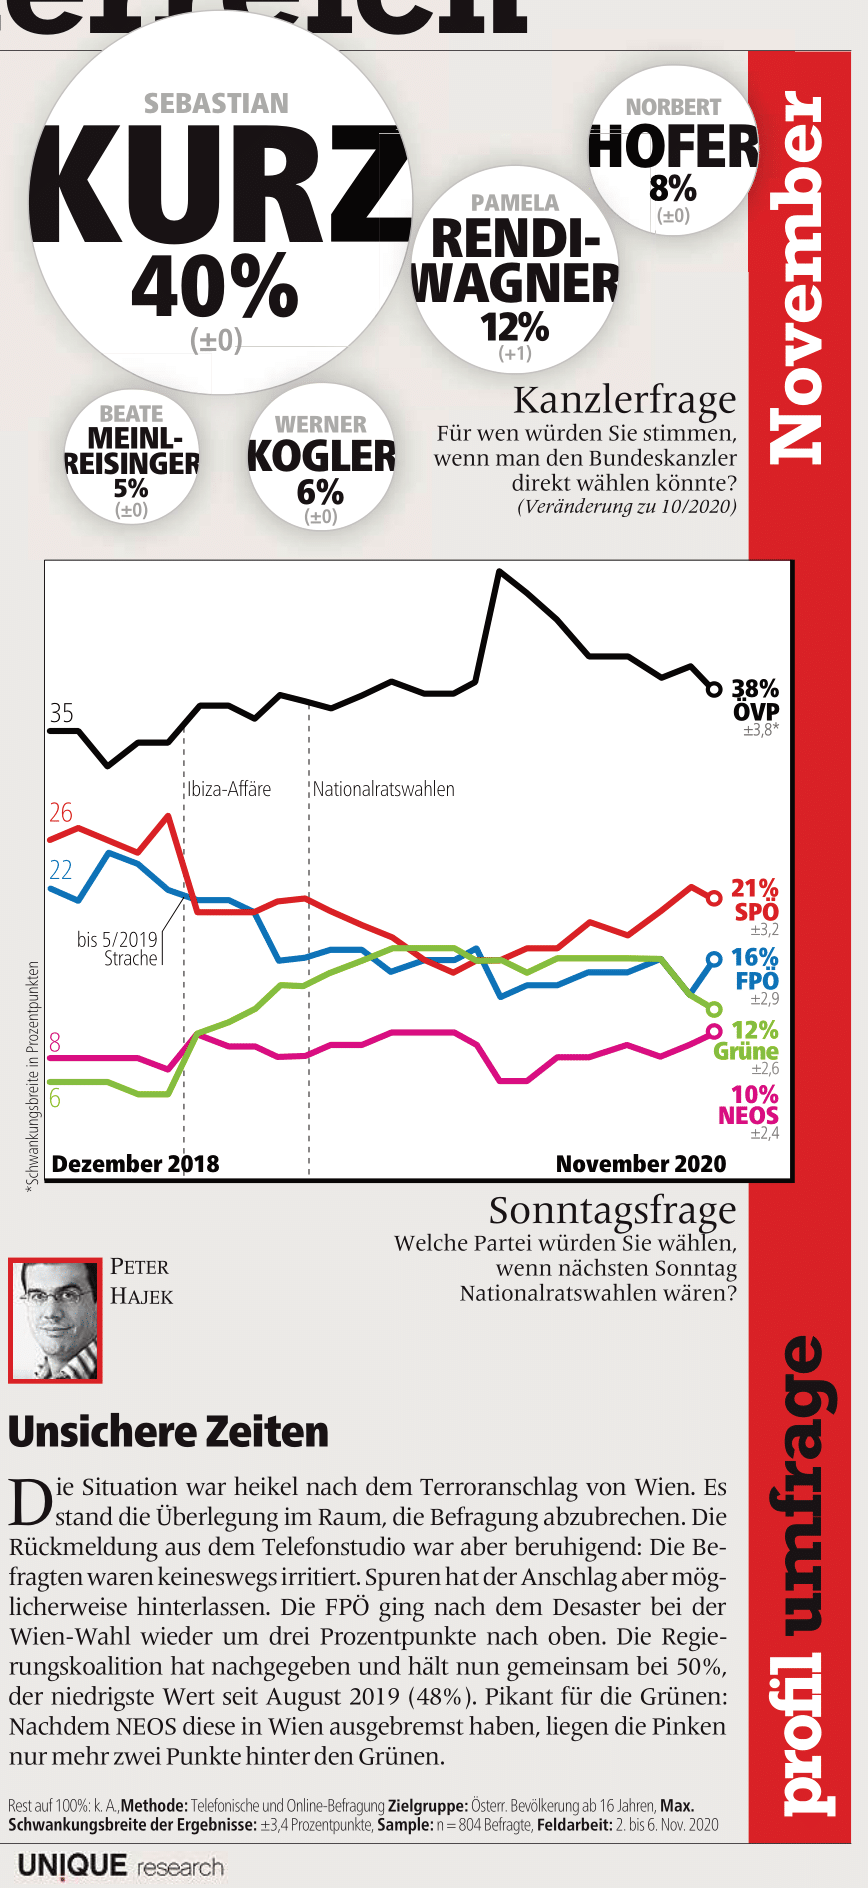 unique research peter hajek josef kalina umfrage politik wahlen waehlertrend profil hochschaetzung sonntagsfrage november print artikel profil 2020